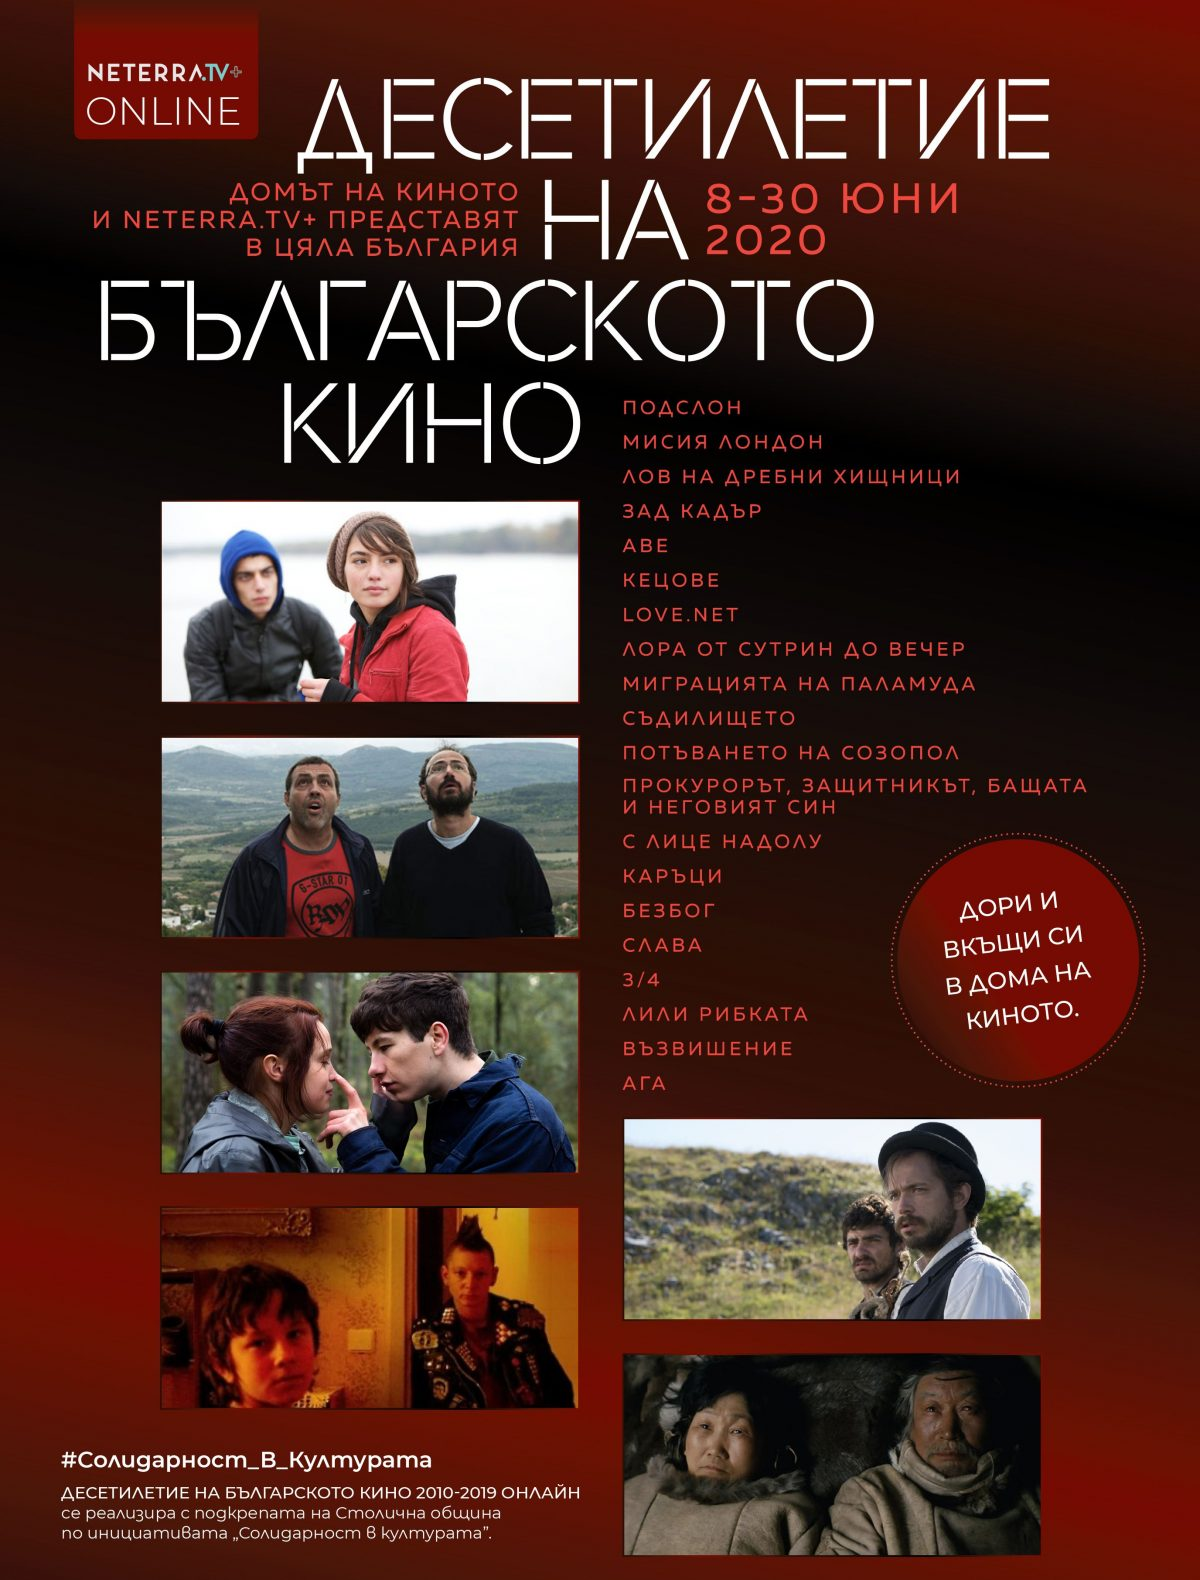 Десетилетие на българското кино